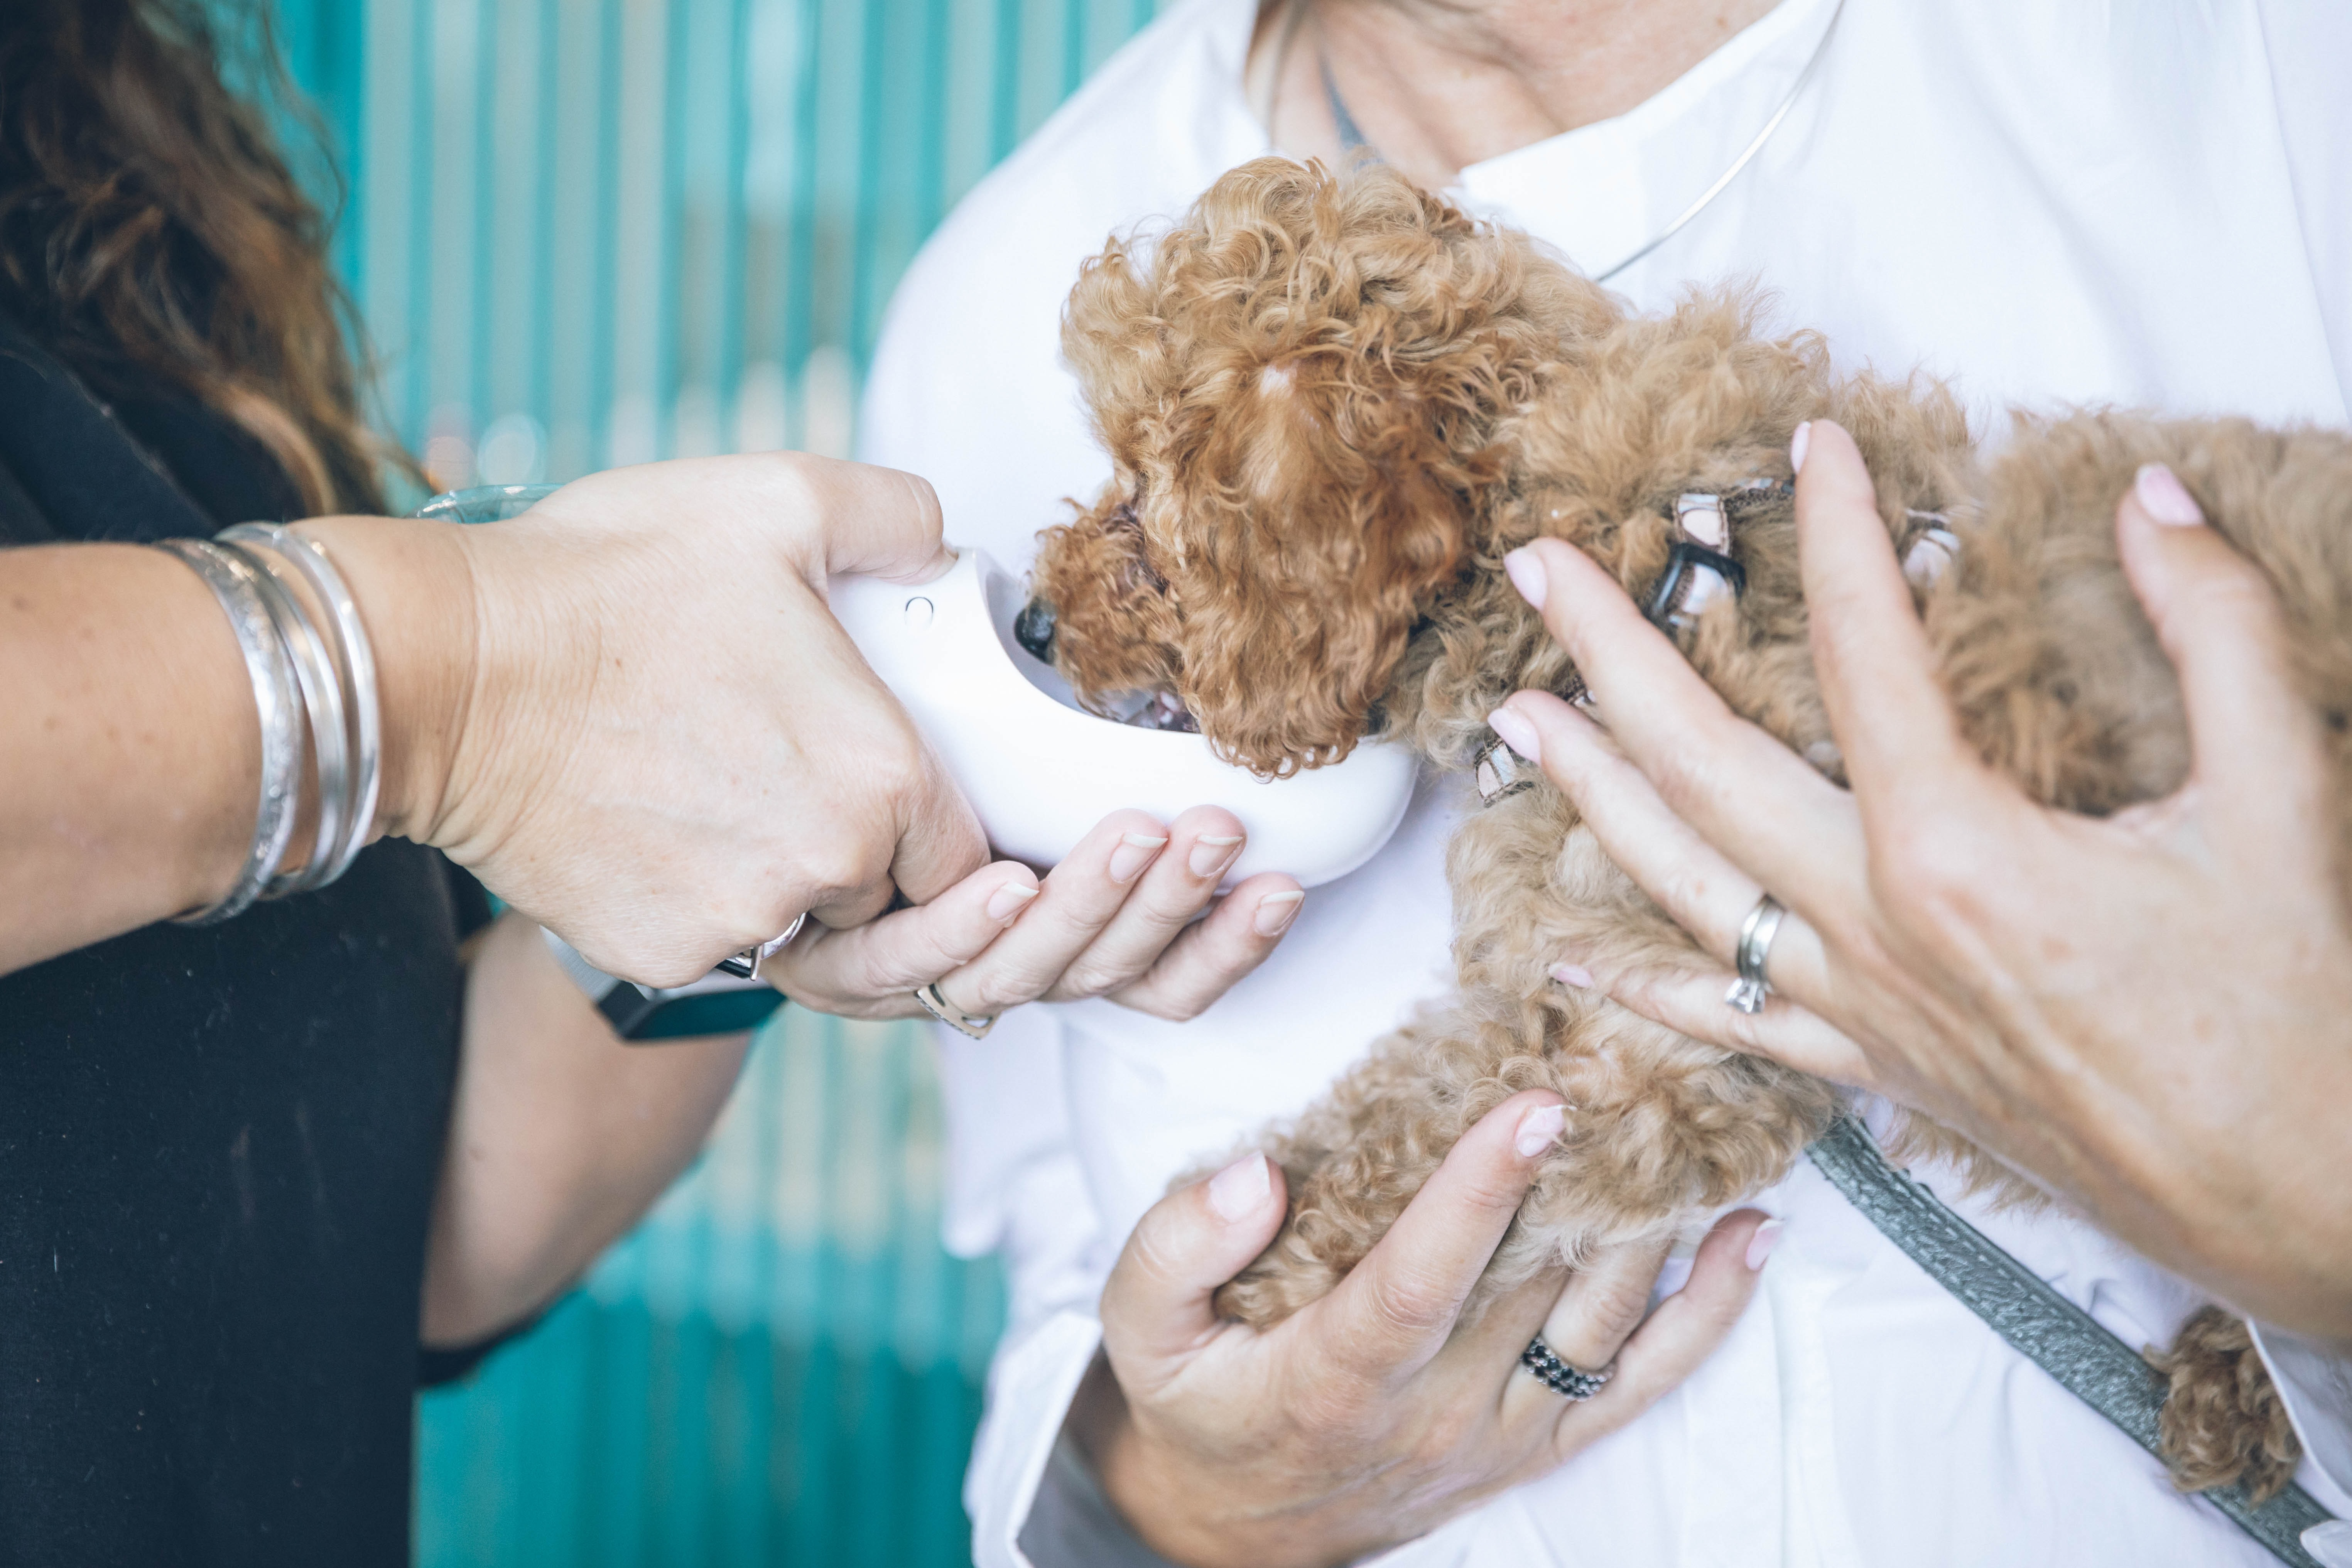 affordable vet care - dog drinking from bottle